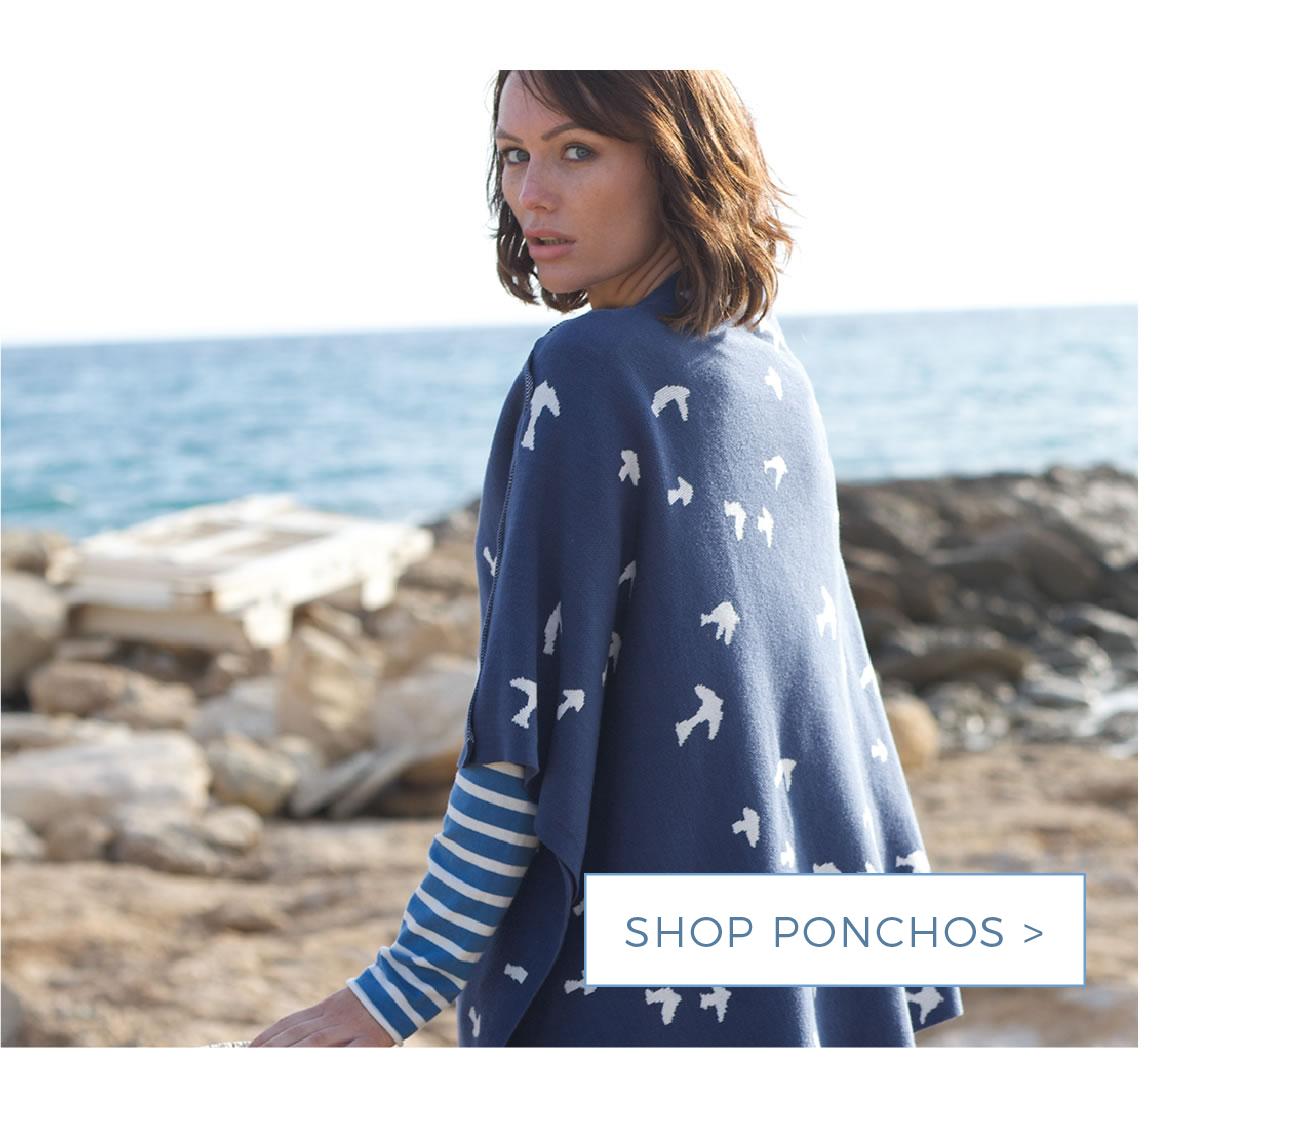 Shop Ponchos